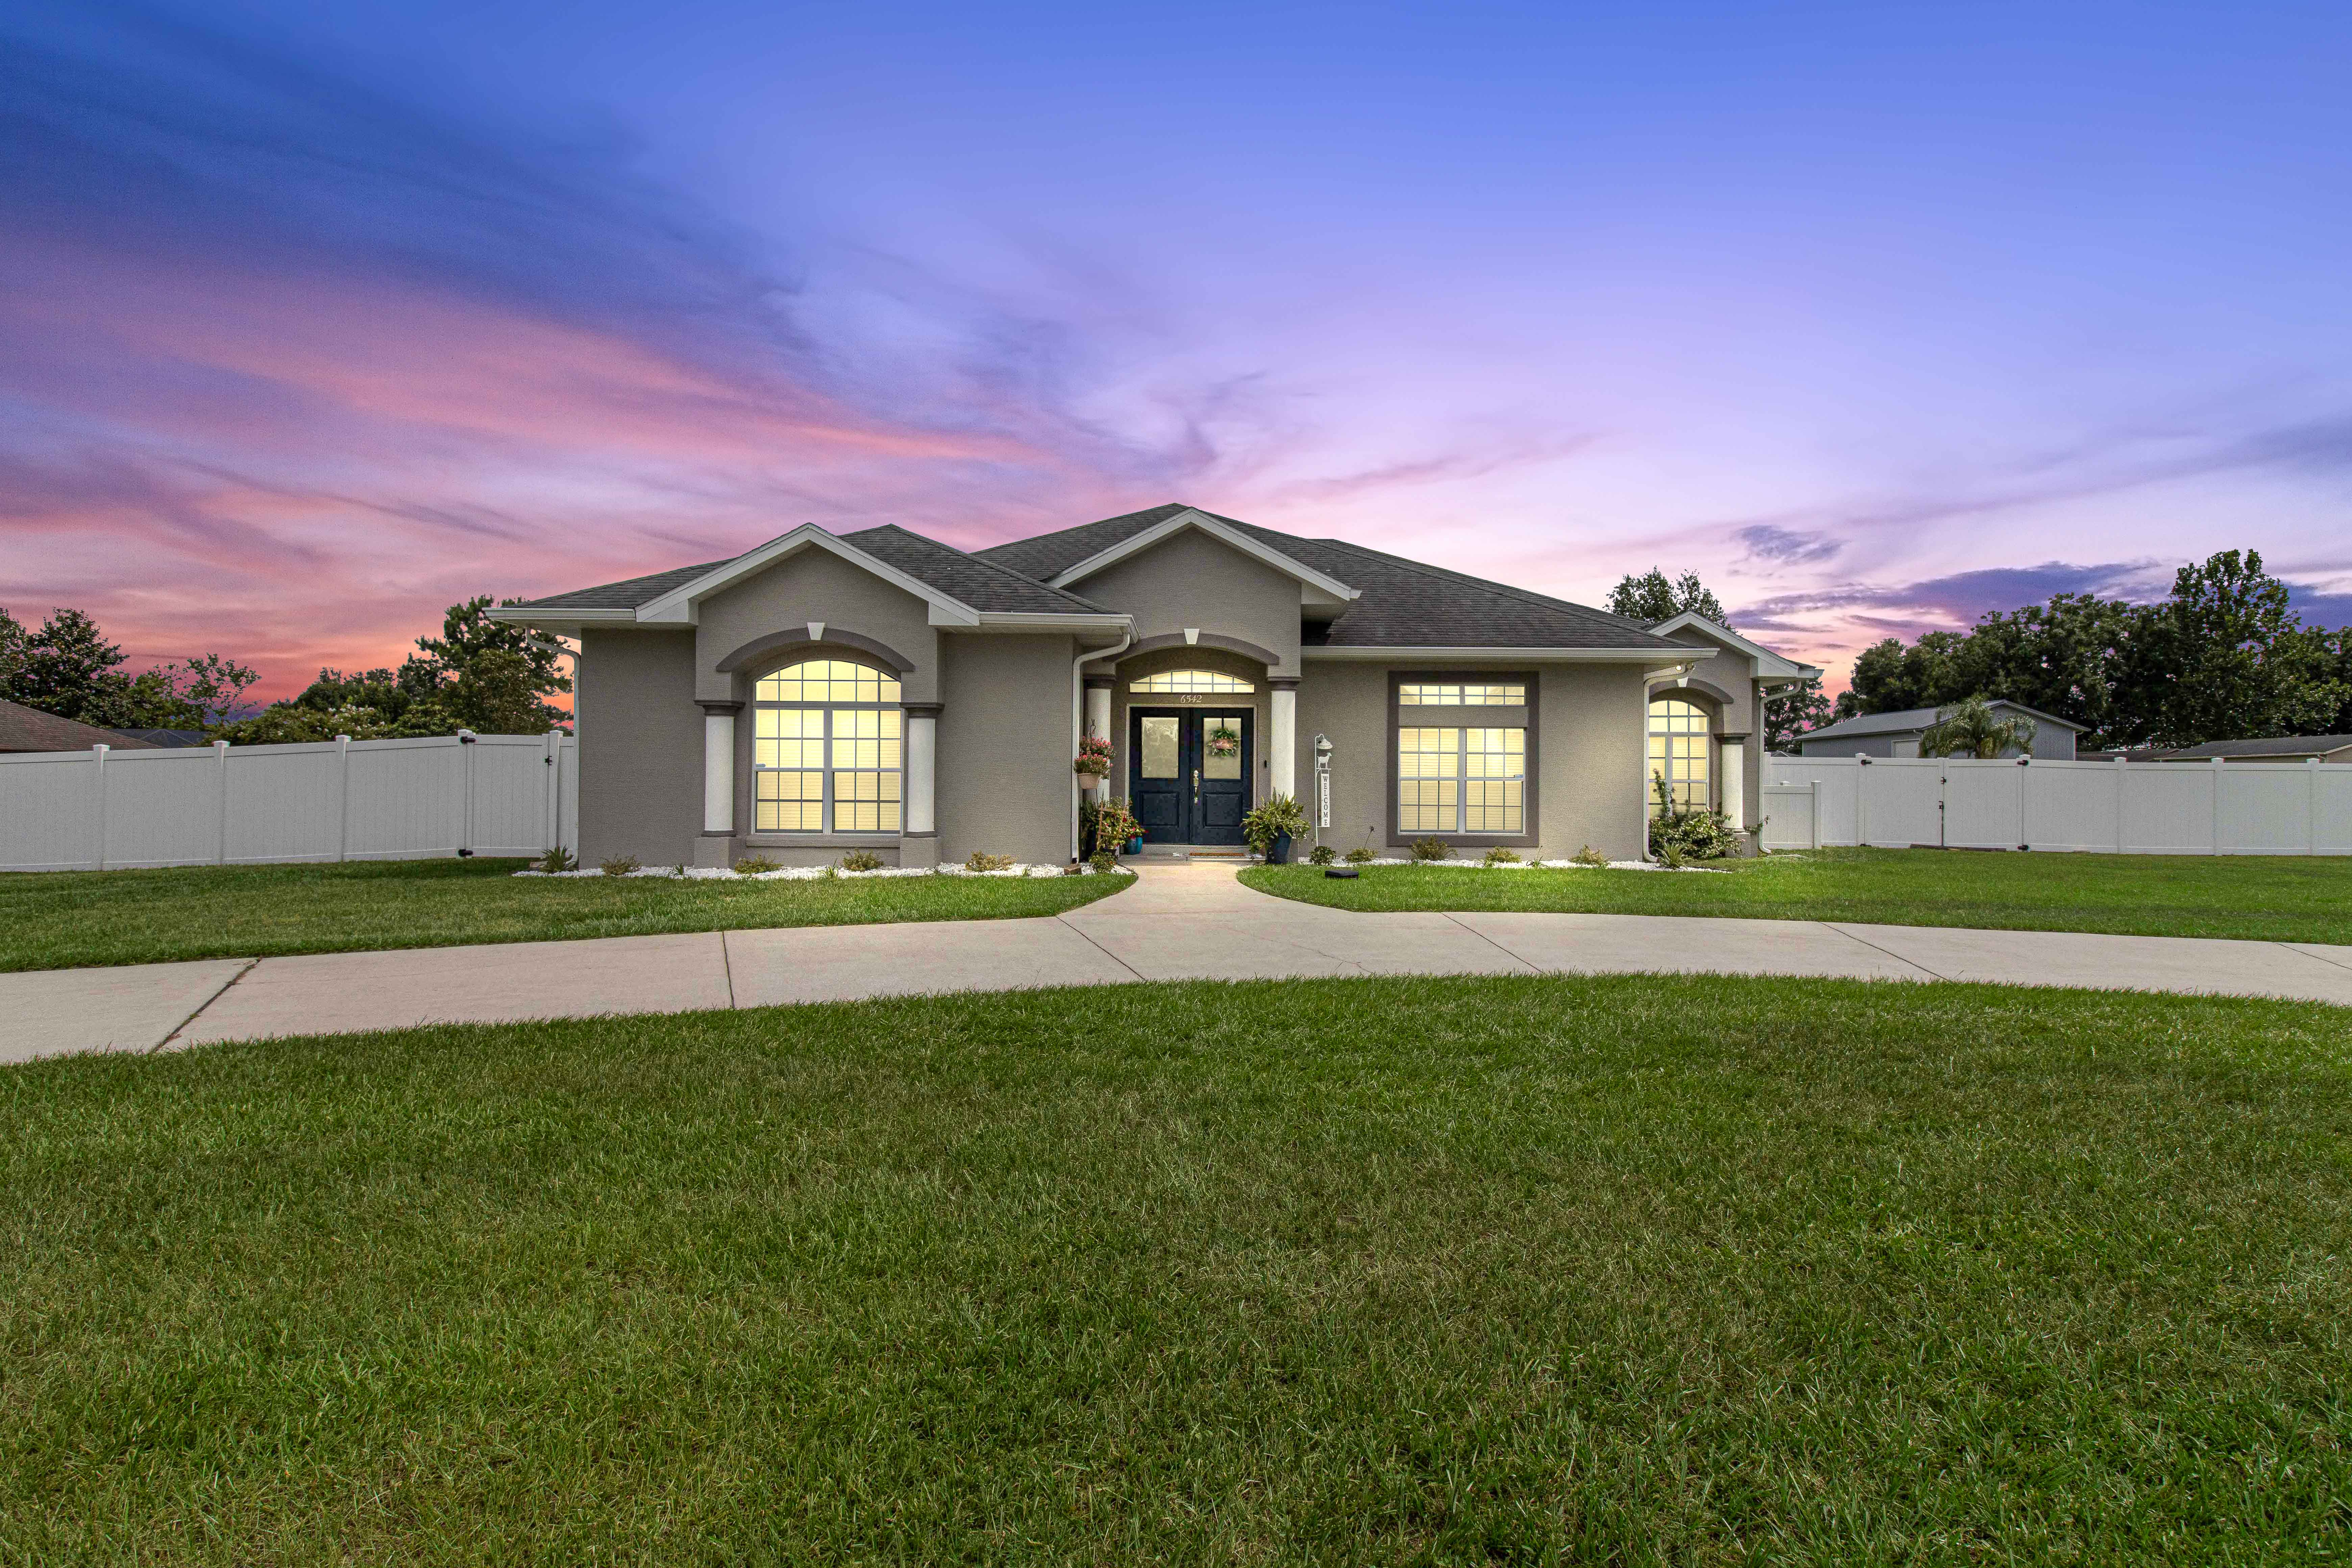 6542 SE 87th Street, Ocala, Florida 34472  - ocala fl home for sale